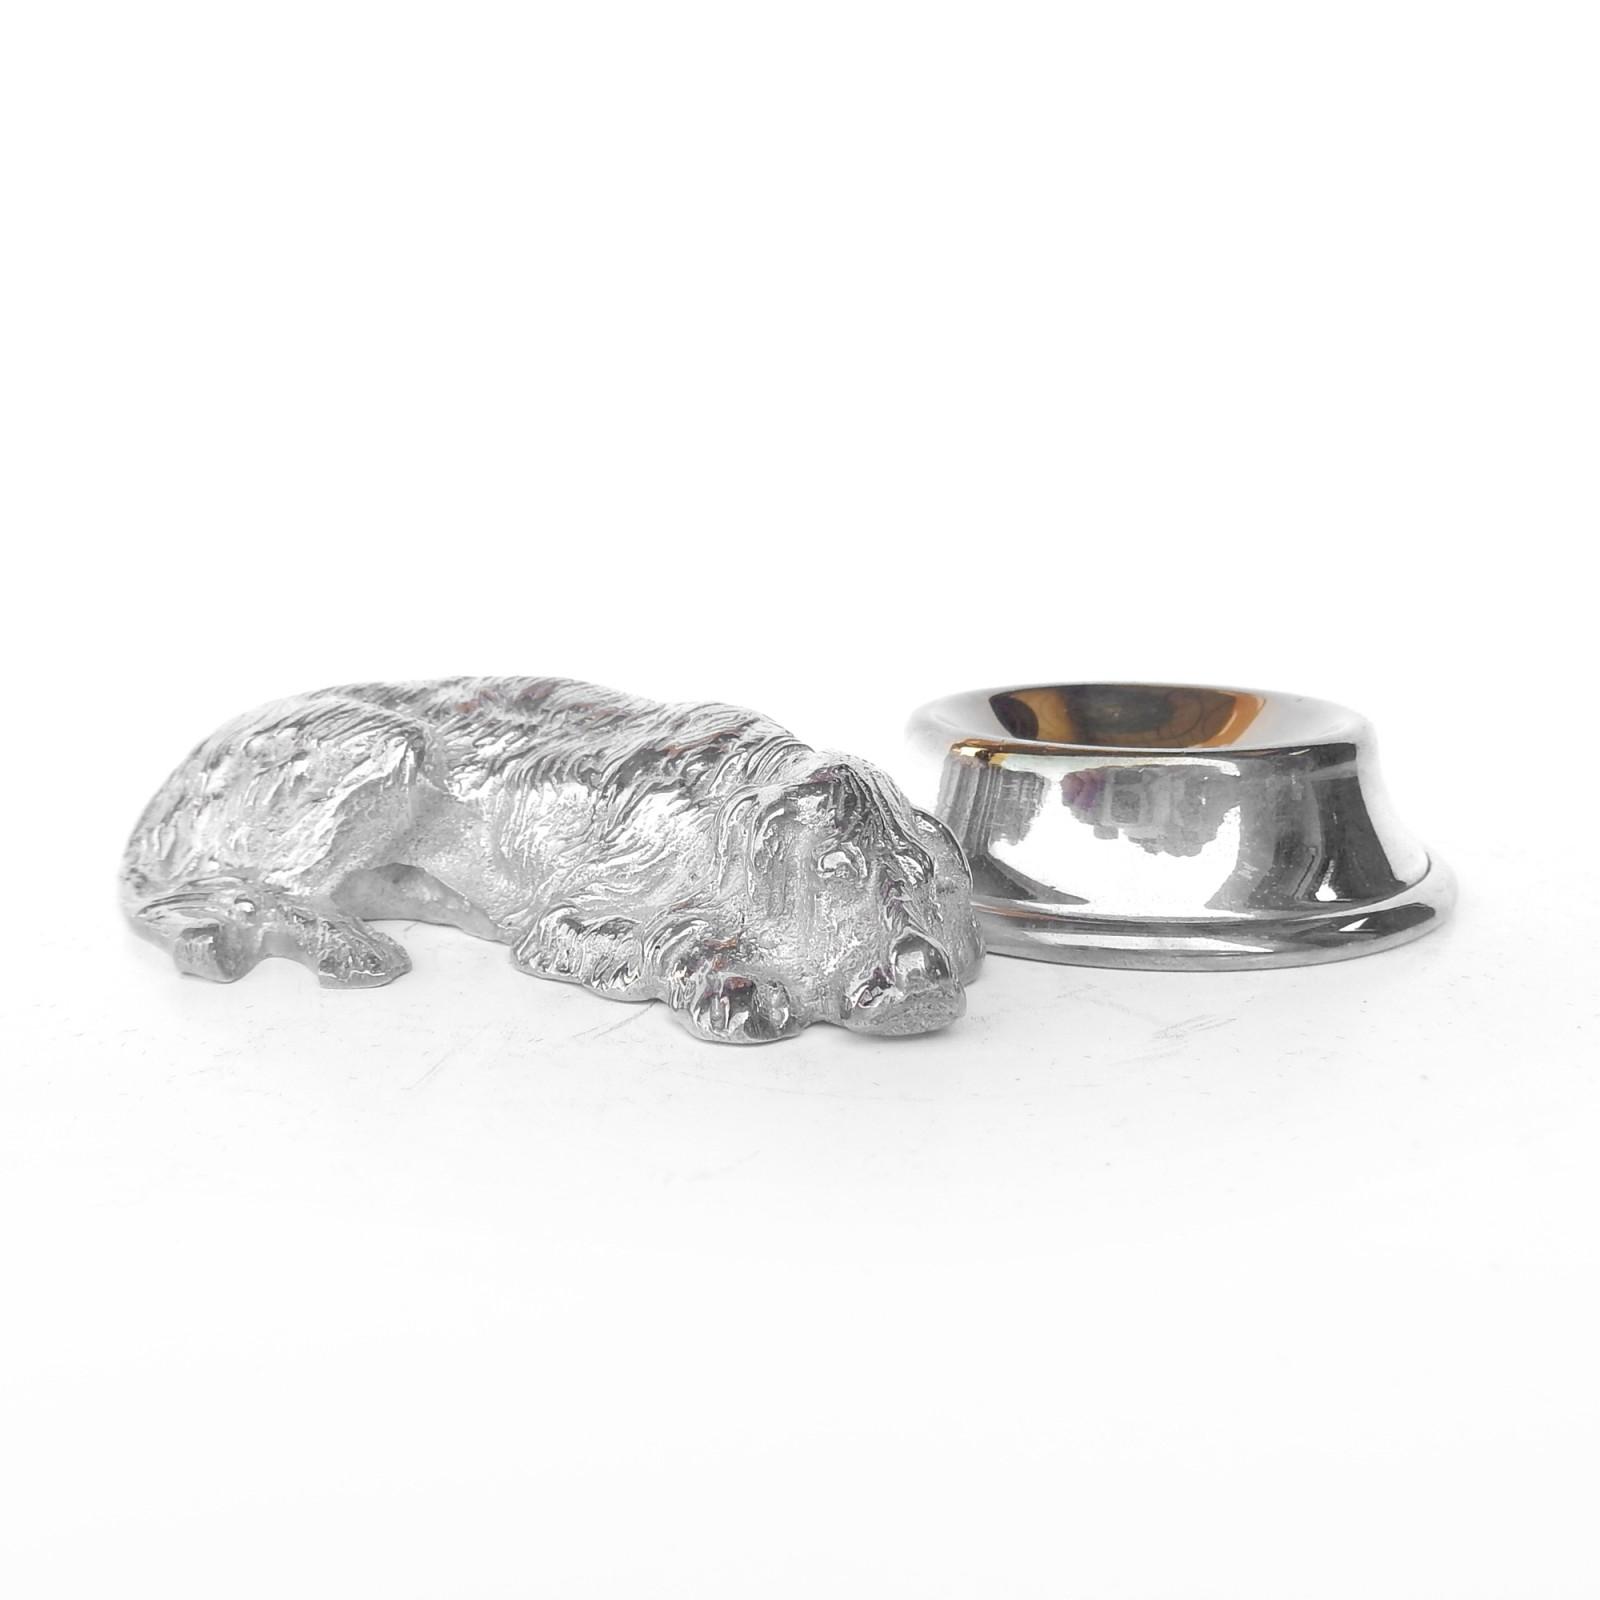 Photo of Novelty Silverplated Sleeping Dog Table Salt Cellar